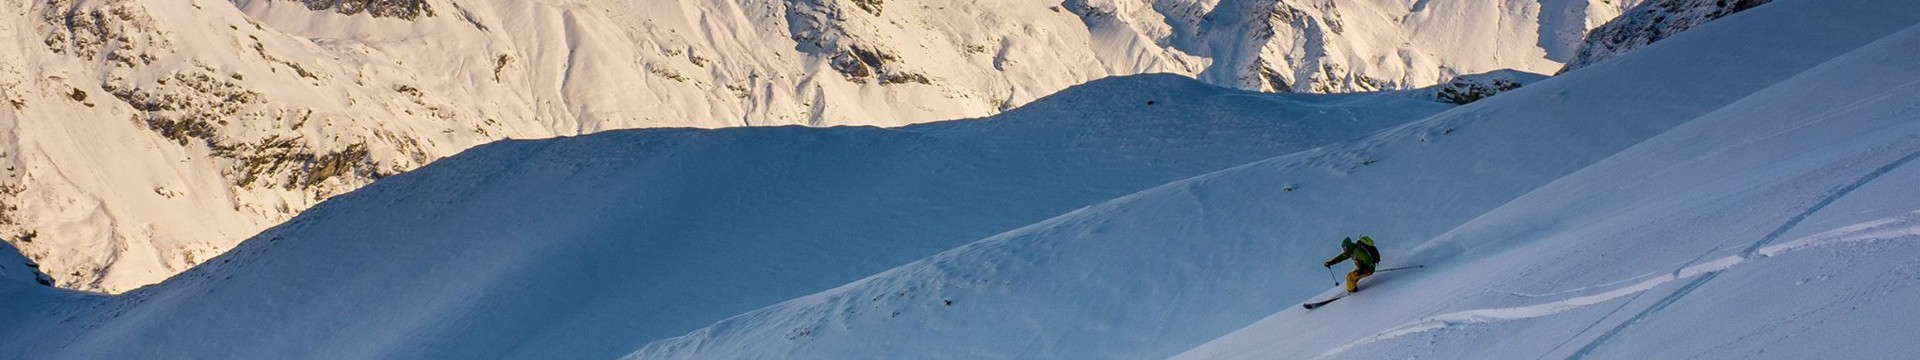 ski-08-8778